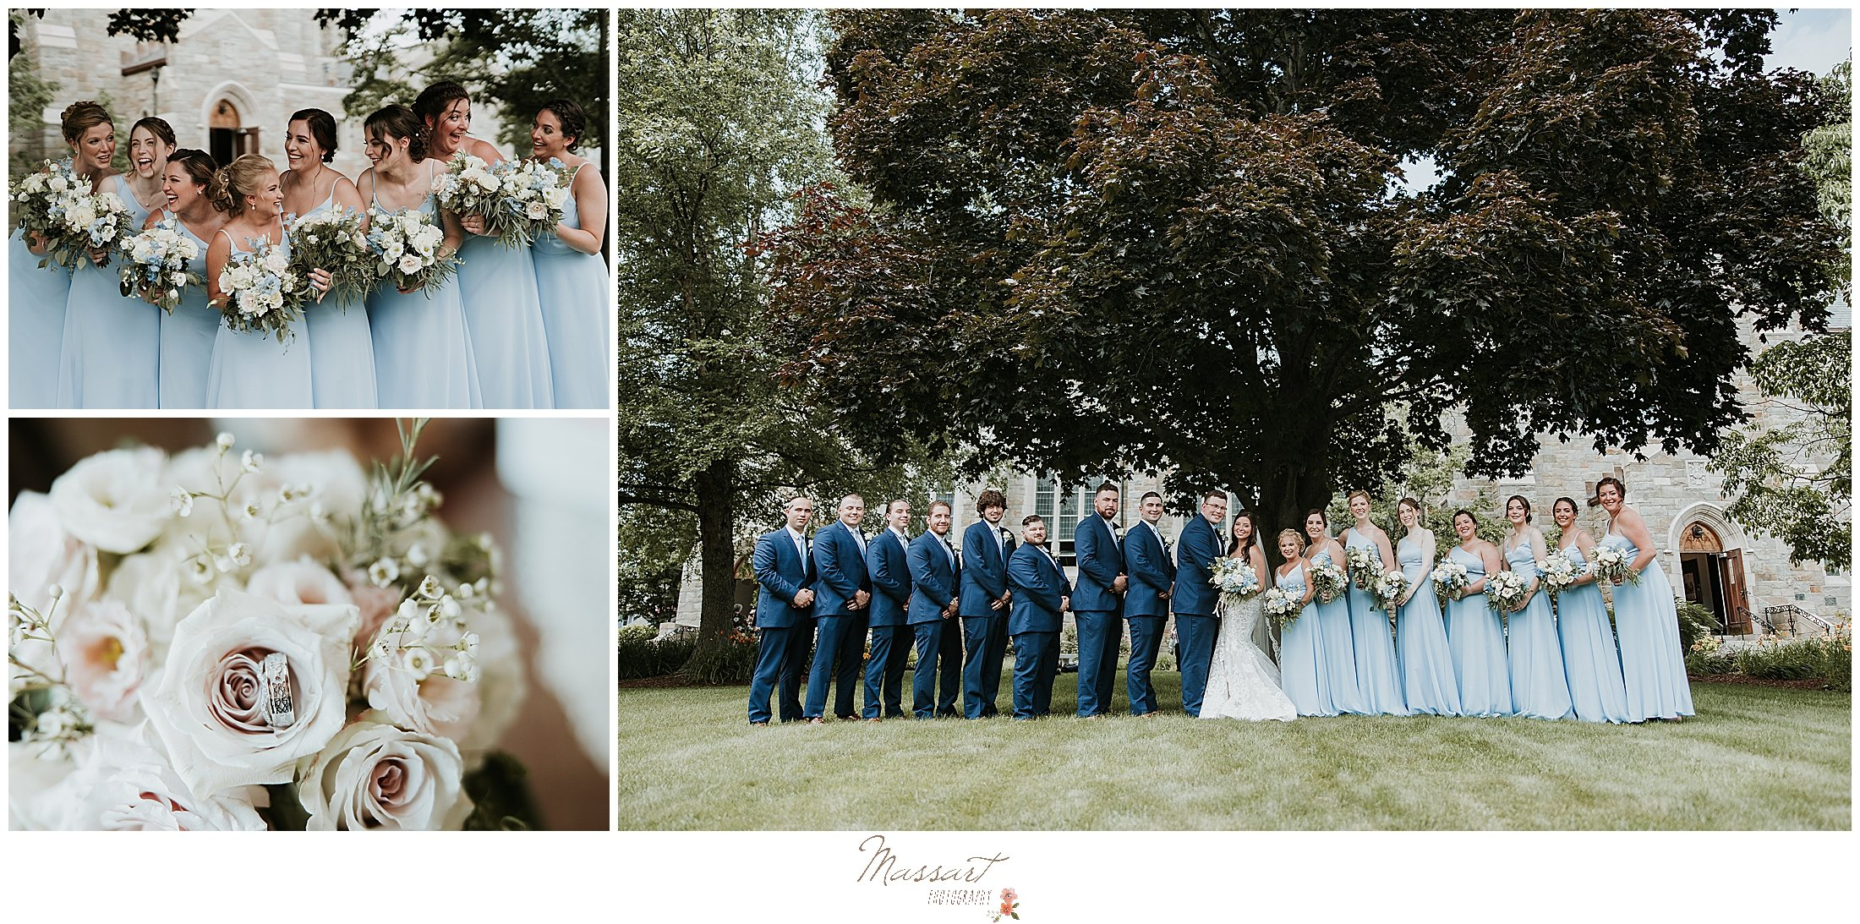 Wedding bridal party poses for RI portraits